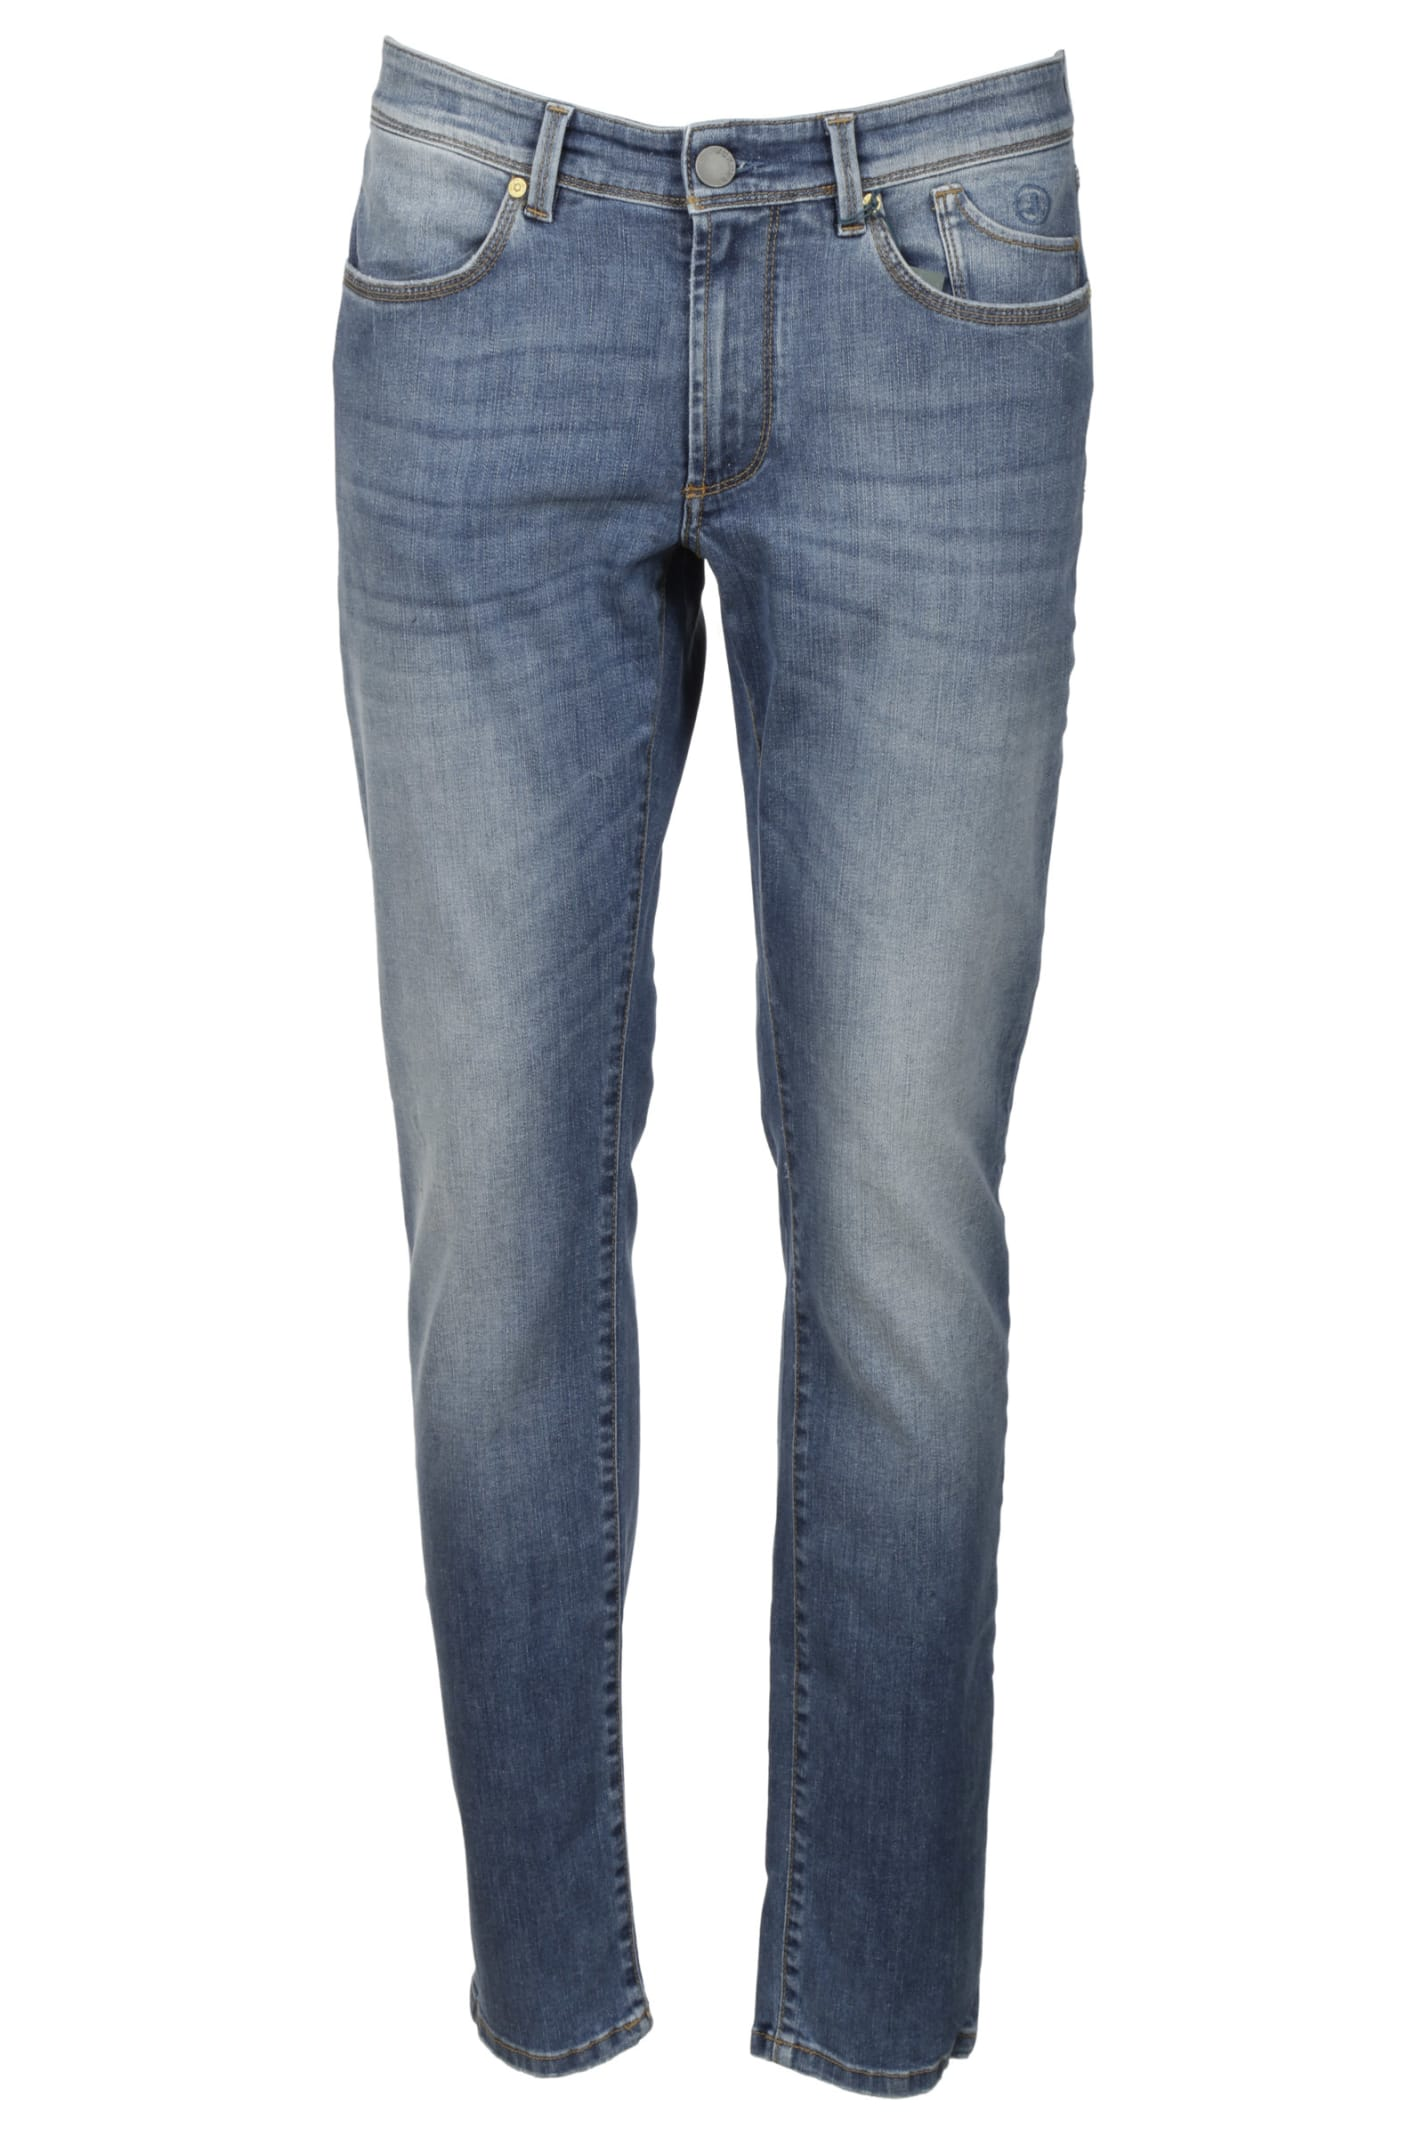 5 Pockets Slim Jeans